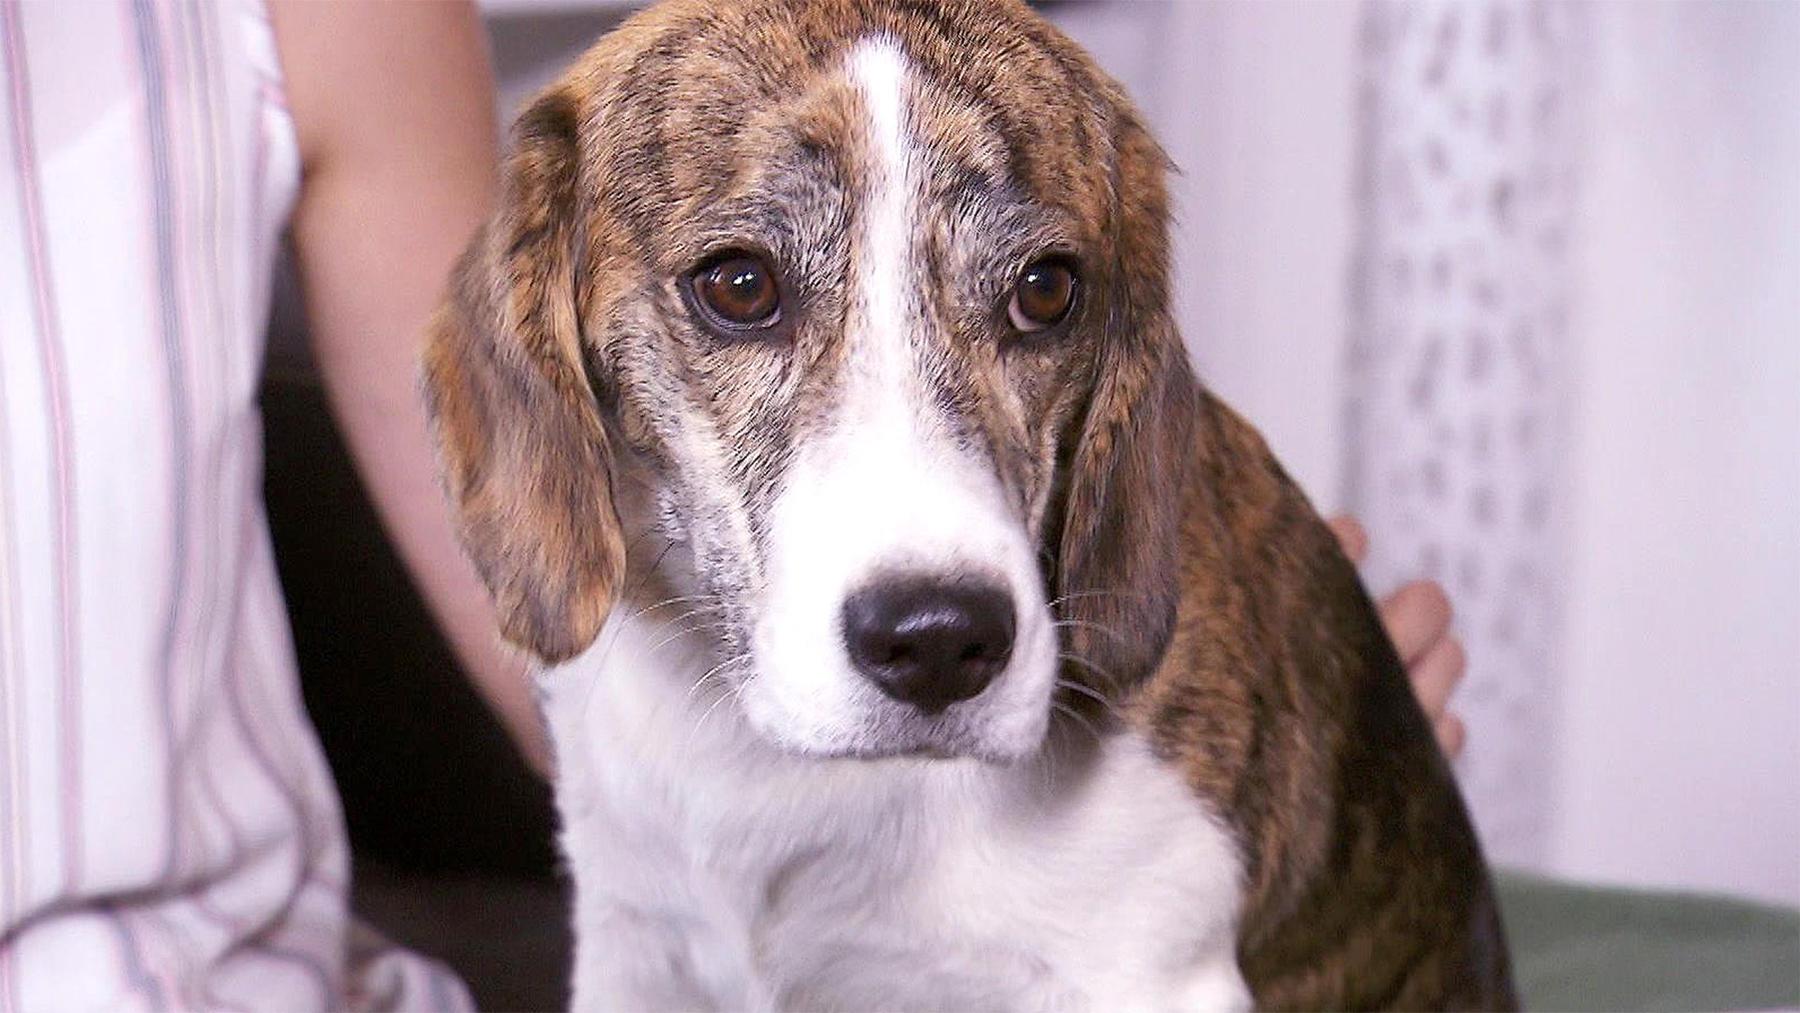 Heute u.a. mit: Celine mit Beagle-Jack Russell Mischling Charly | Folge 8